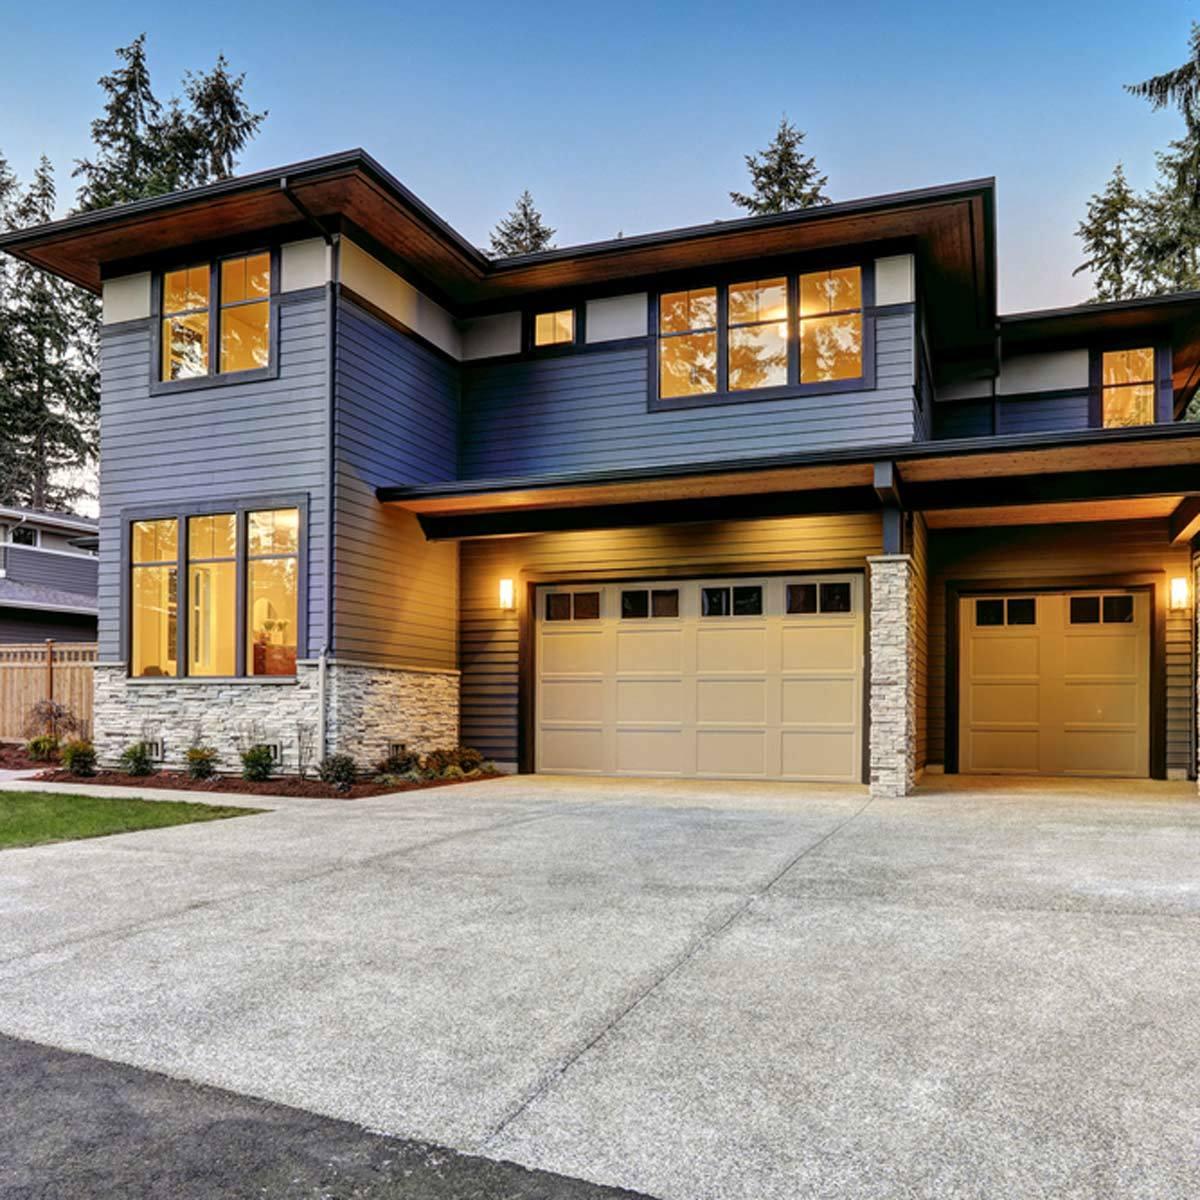 house exterior colors blue-gray SODCBOV